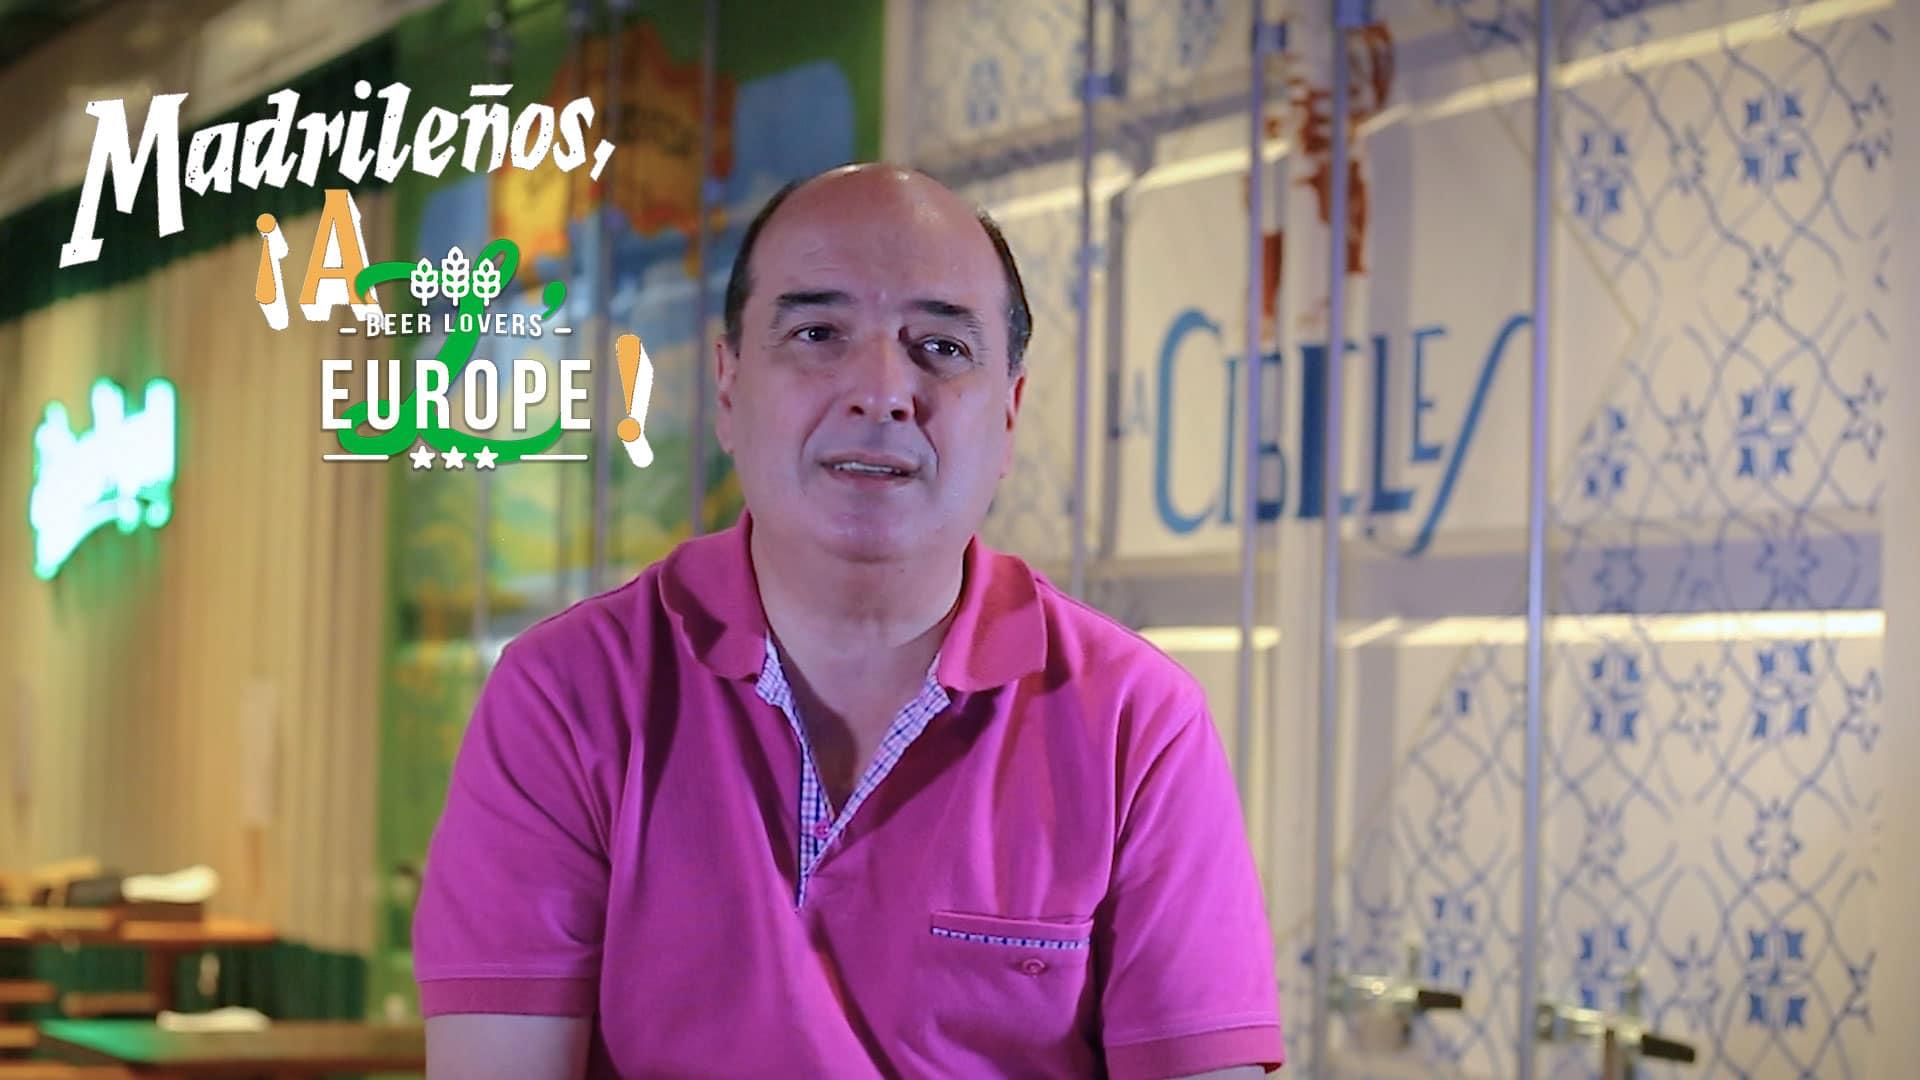 Cervecería l'Europe Madrid